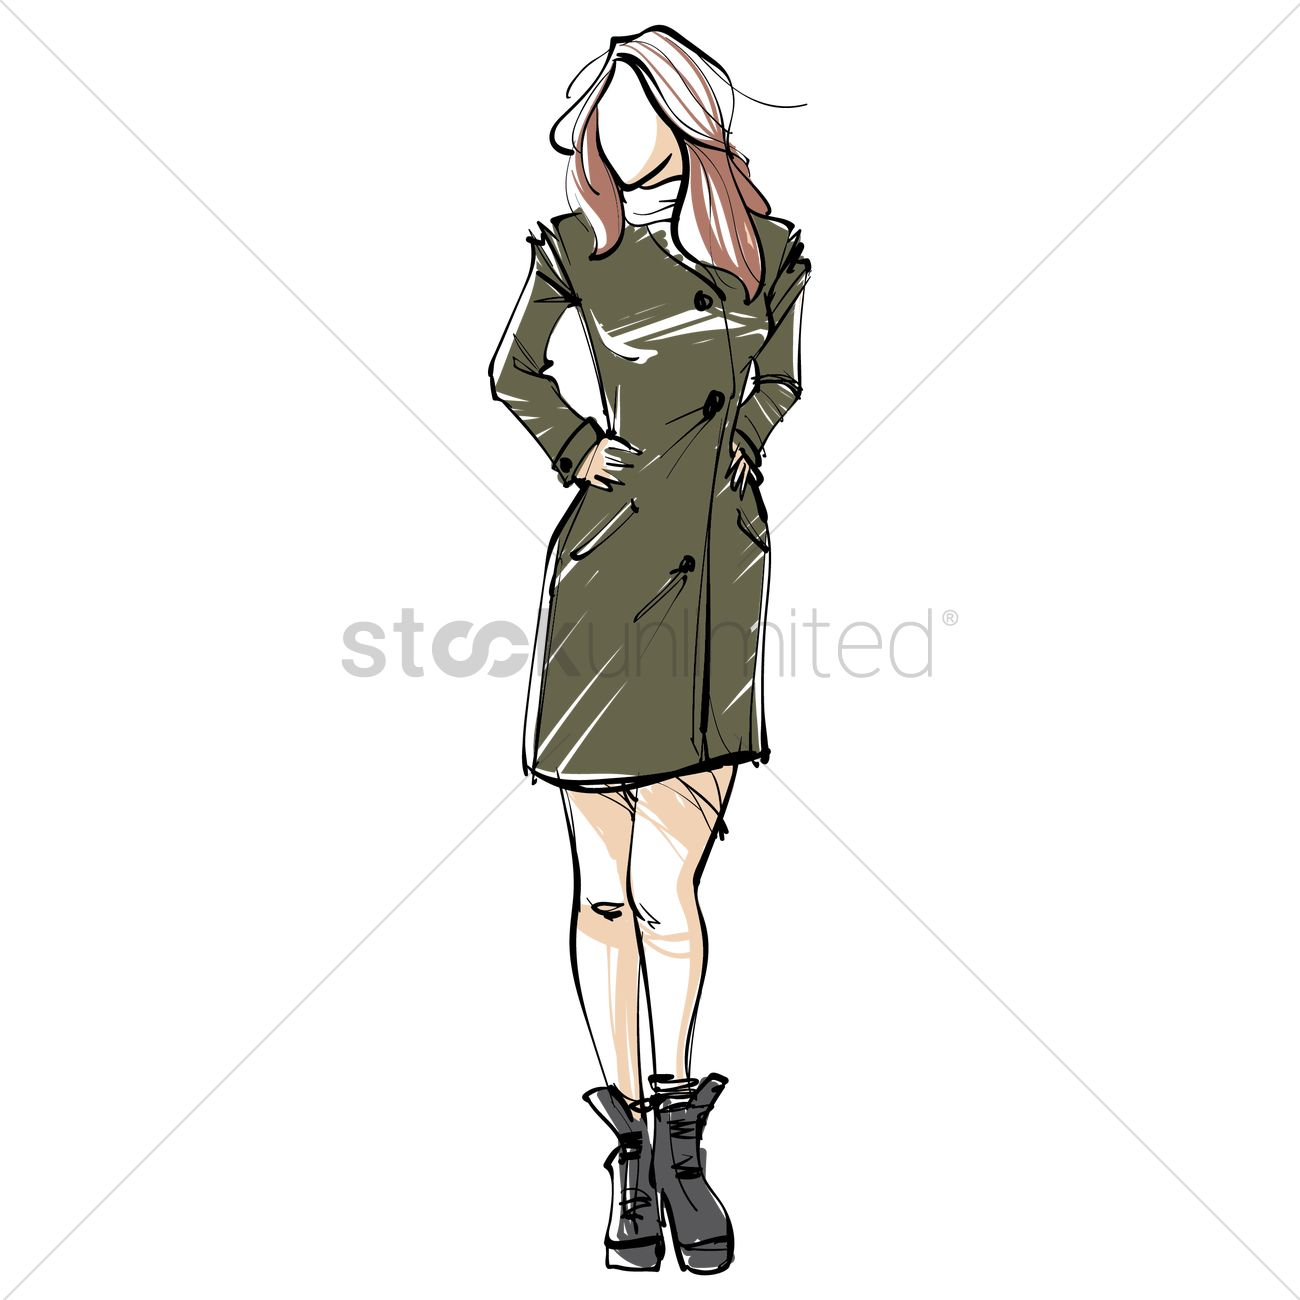 fashion model sketch vector image 2003075 stockunlimited